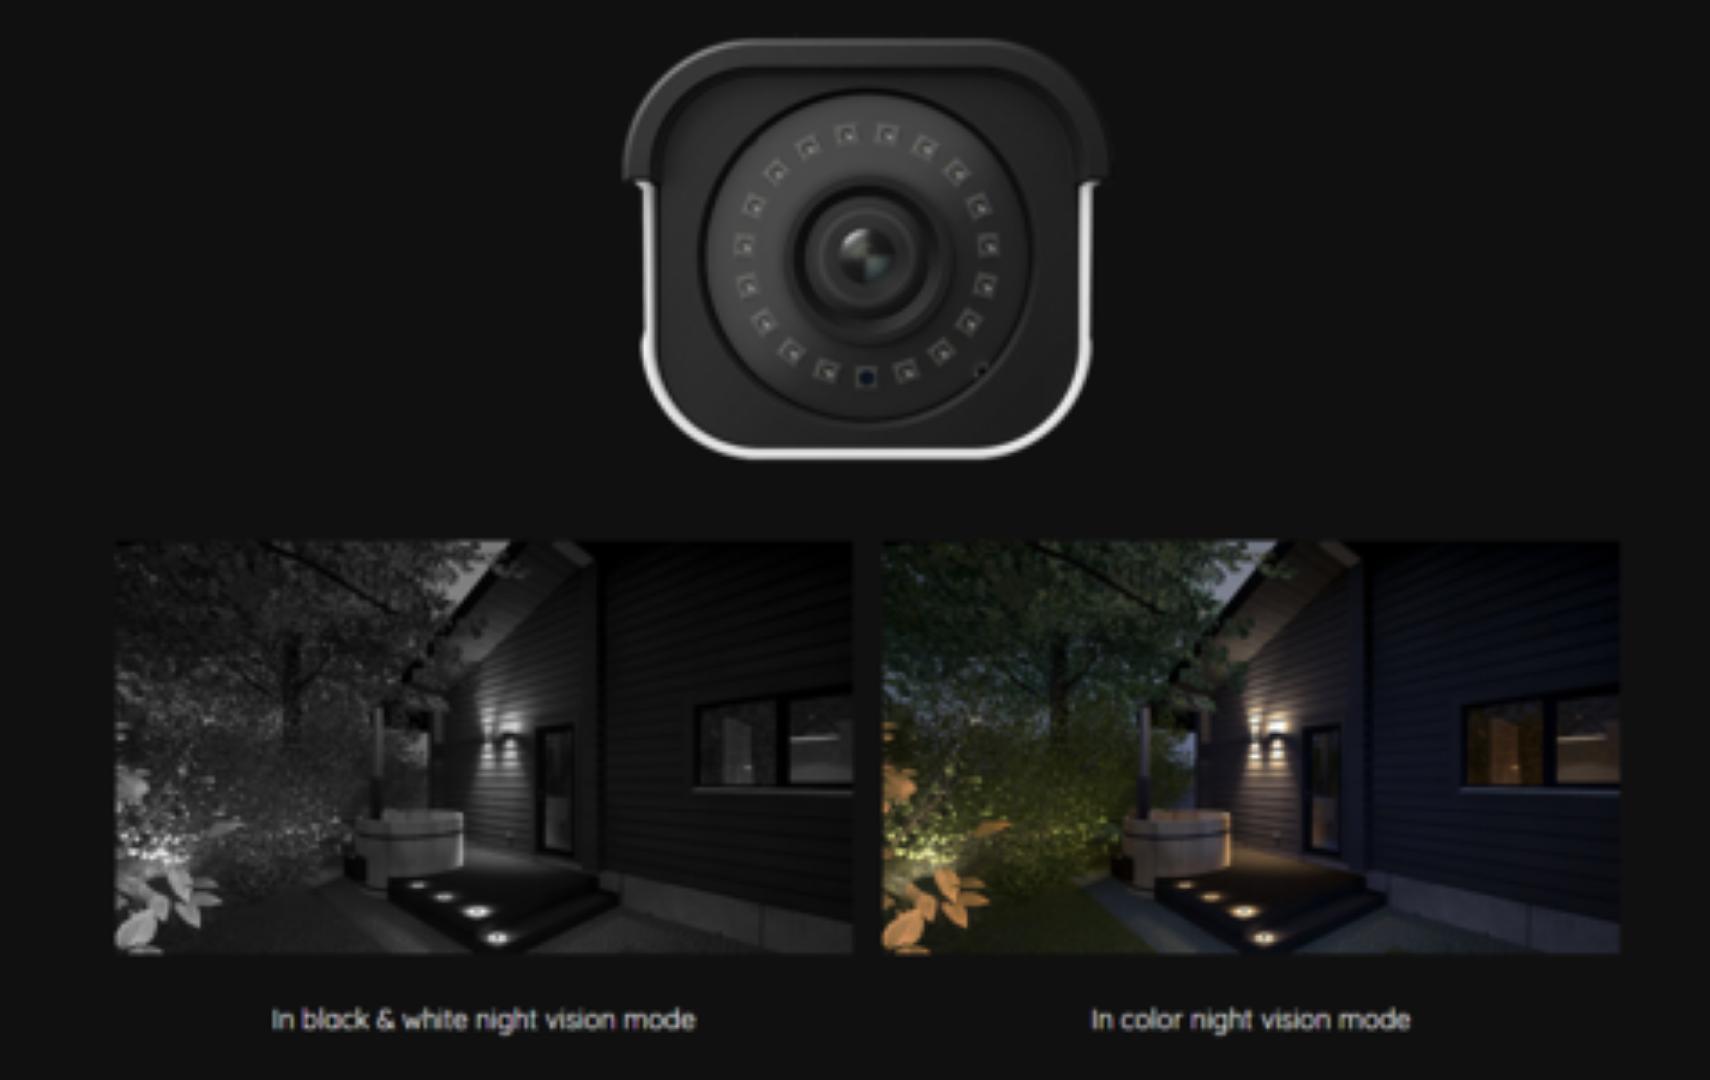 Reolink Rlk8 800b4 4k 8 Channel Poe Security Camera